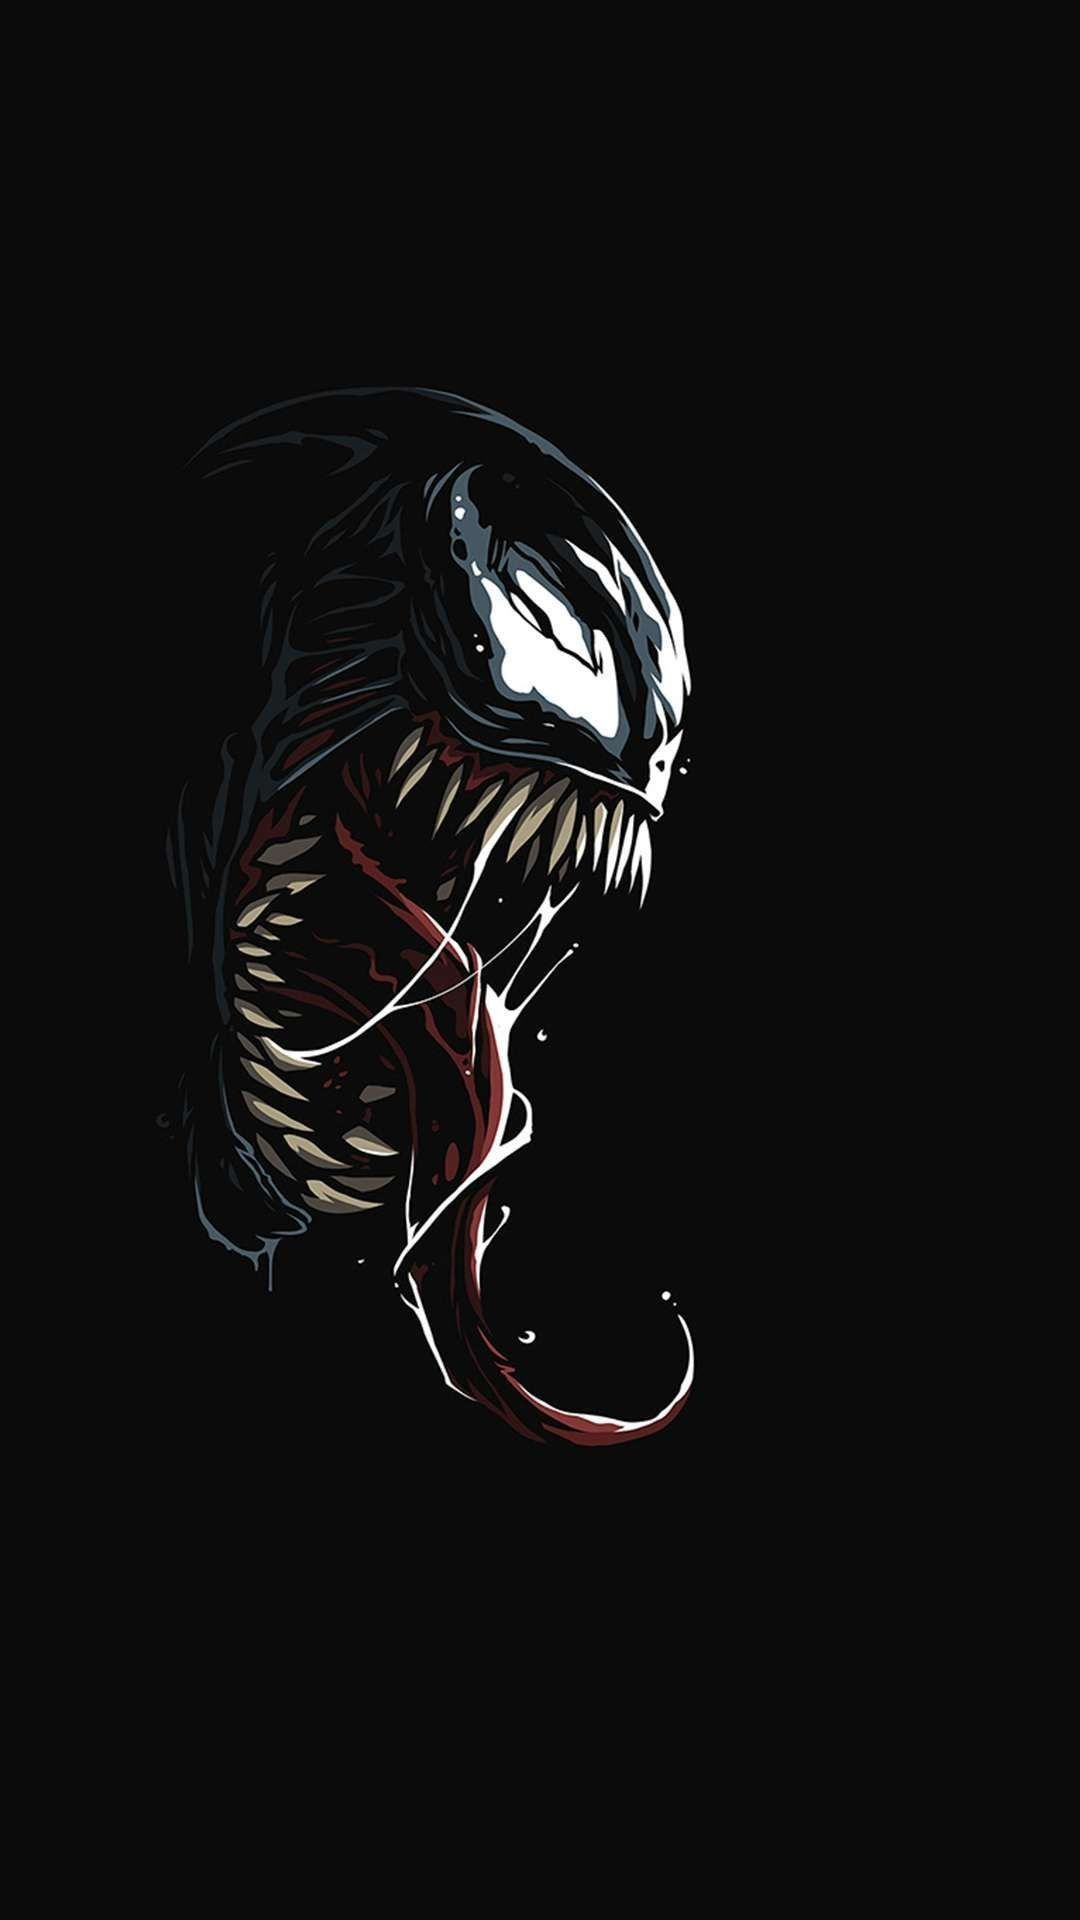 Venom Moviemania Marvel Of Venom Moviemania Marvel Wallpaper Hd Venom Comics Marvel Wallpaper